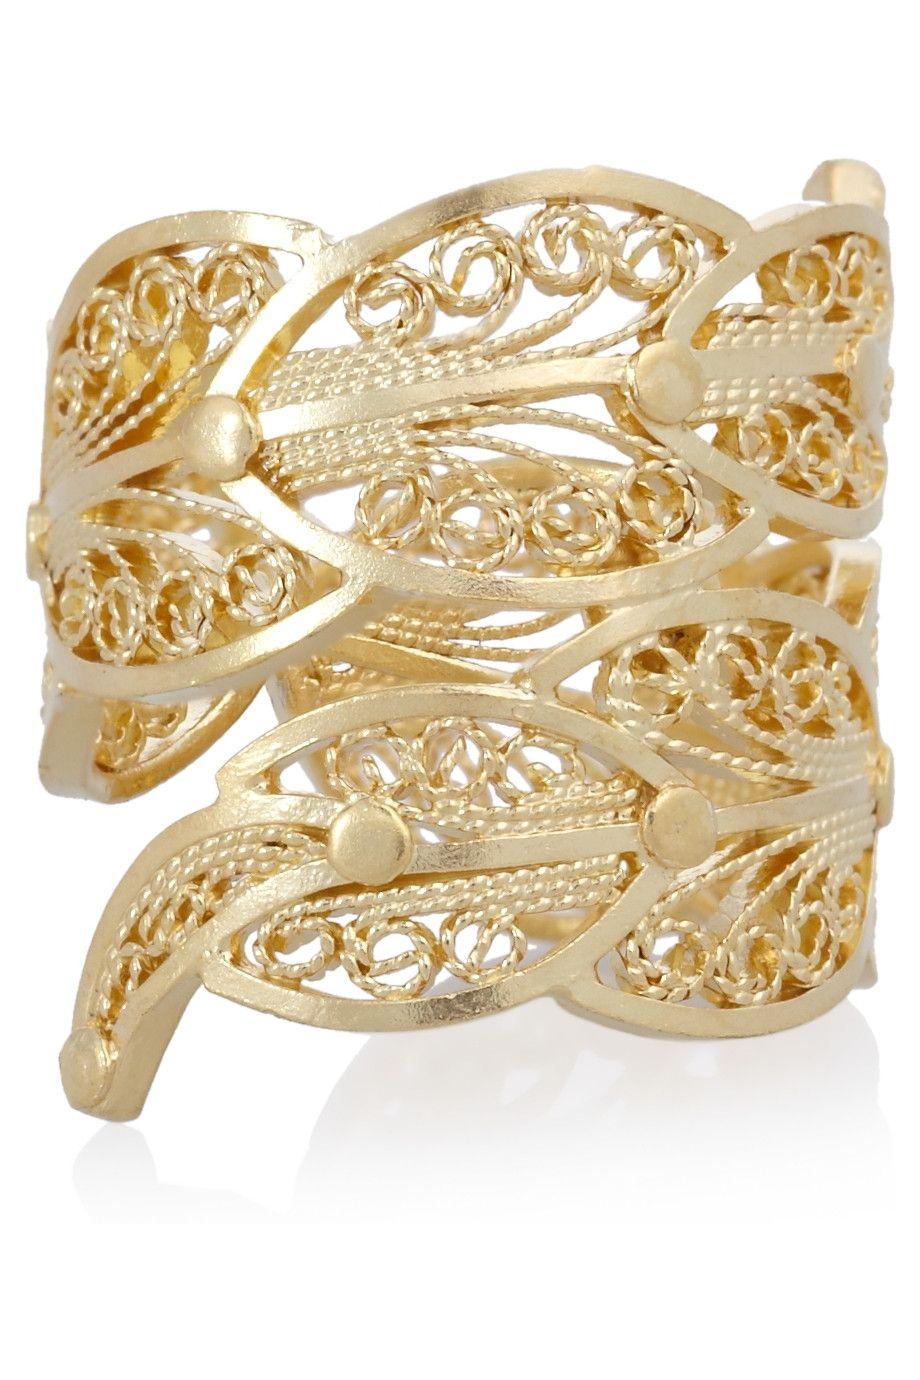 Mallarino Paloma 24-karat gold-vermeil ring   Jewelry ...